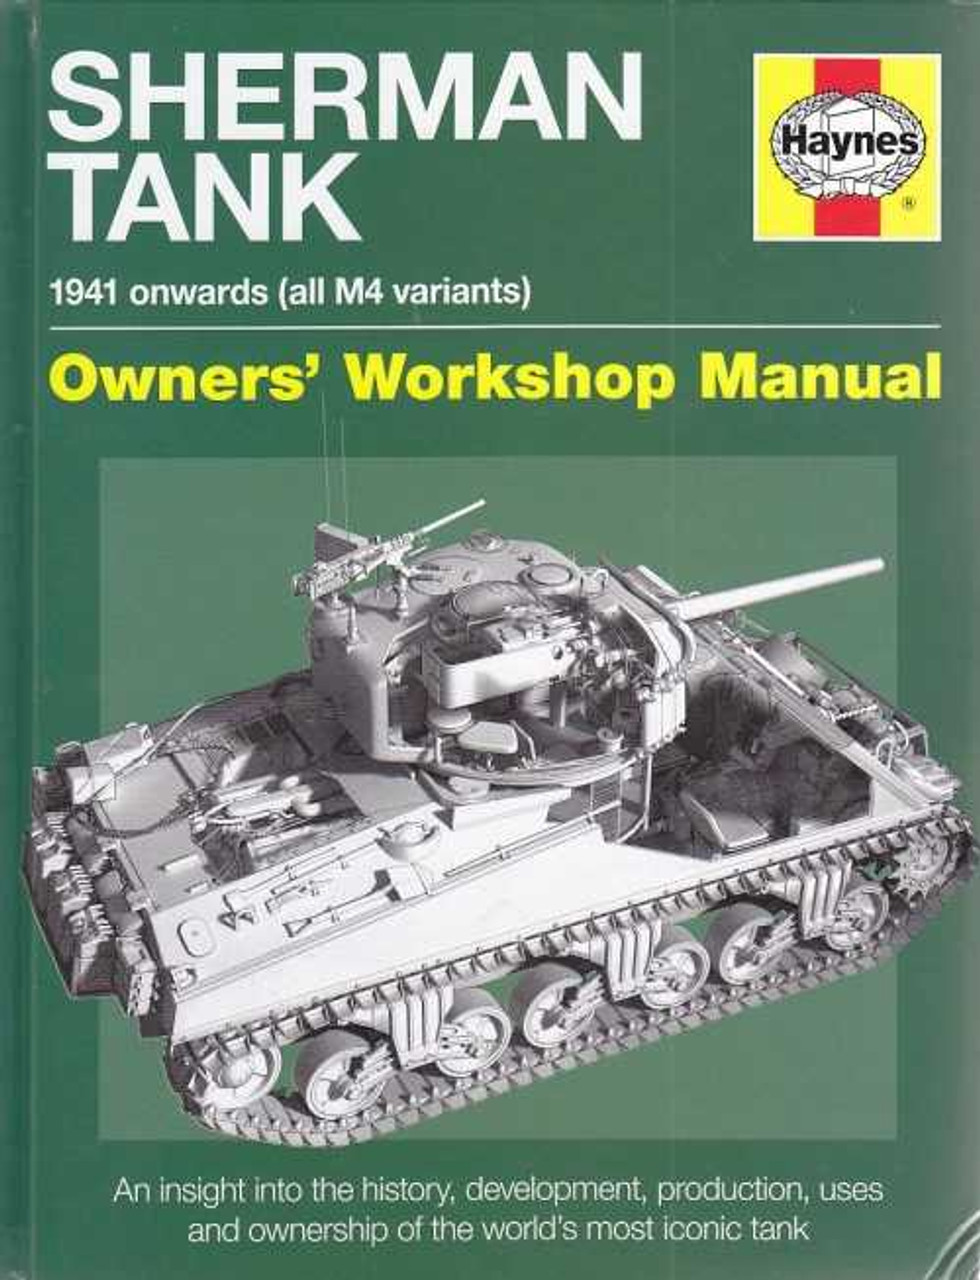 Sherman Tank 1941 onwards (all M4 variants) Owners' Workshop Manual